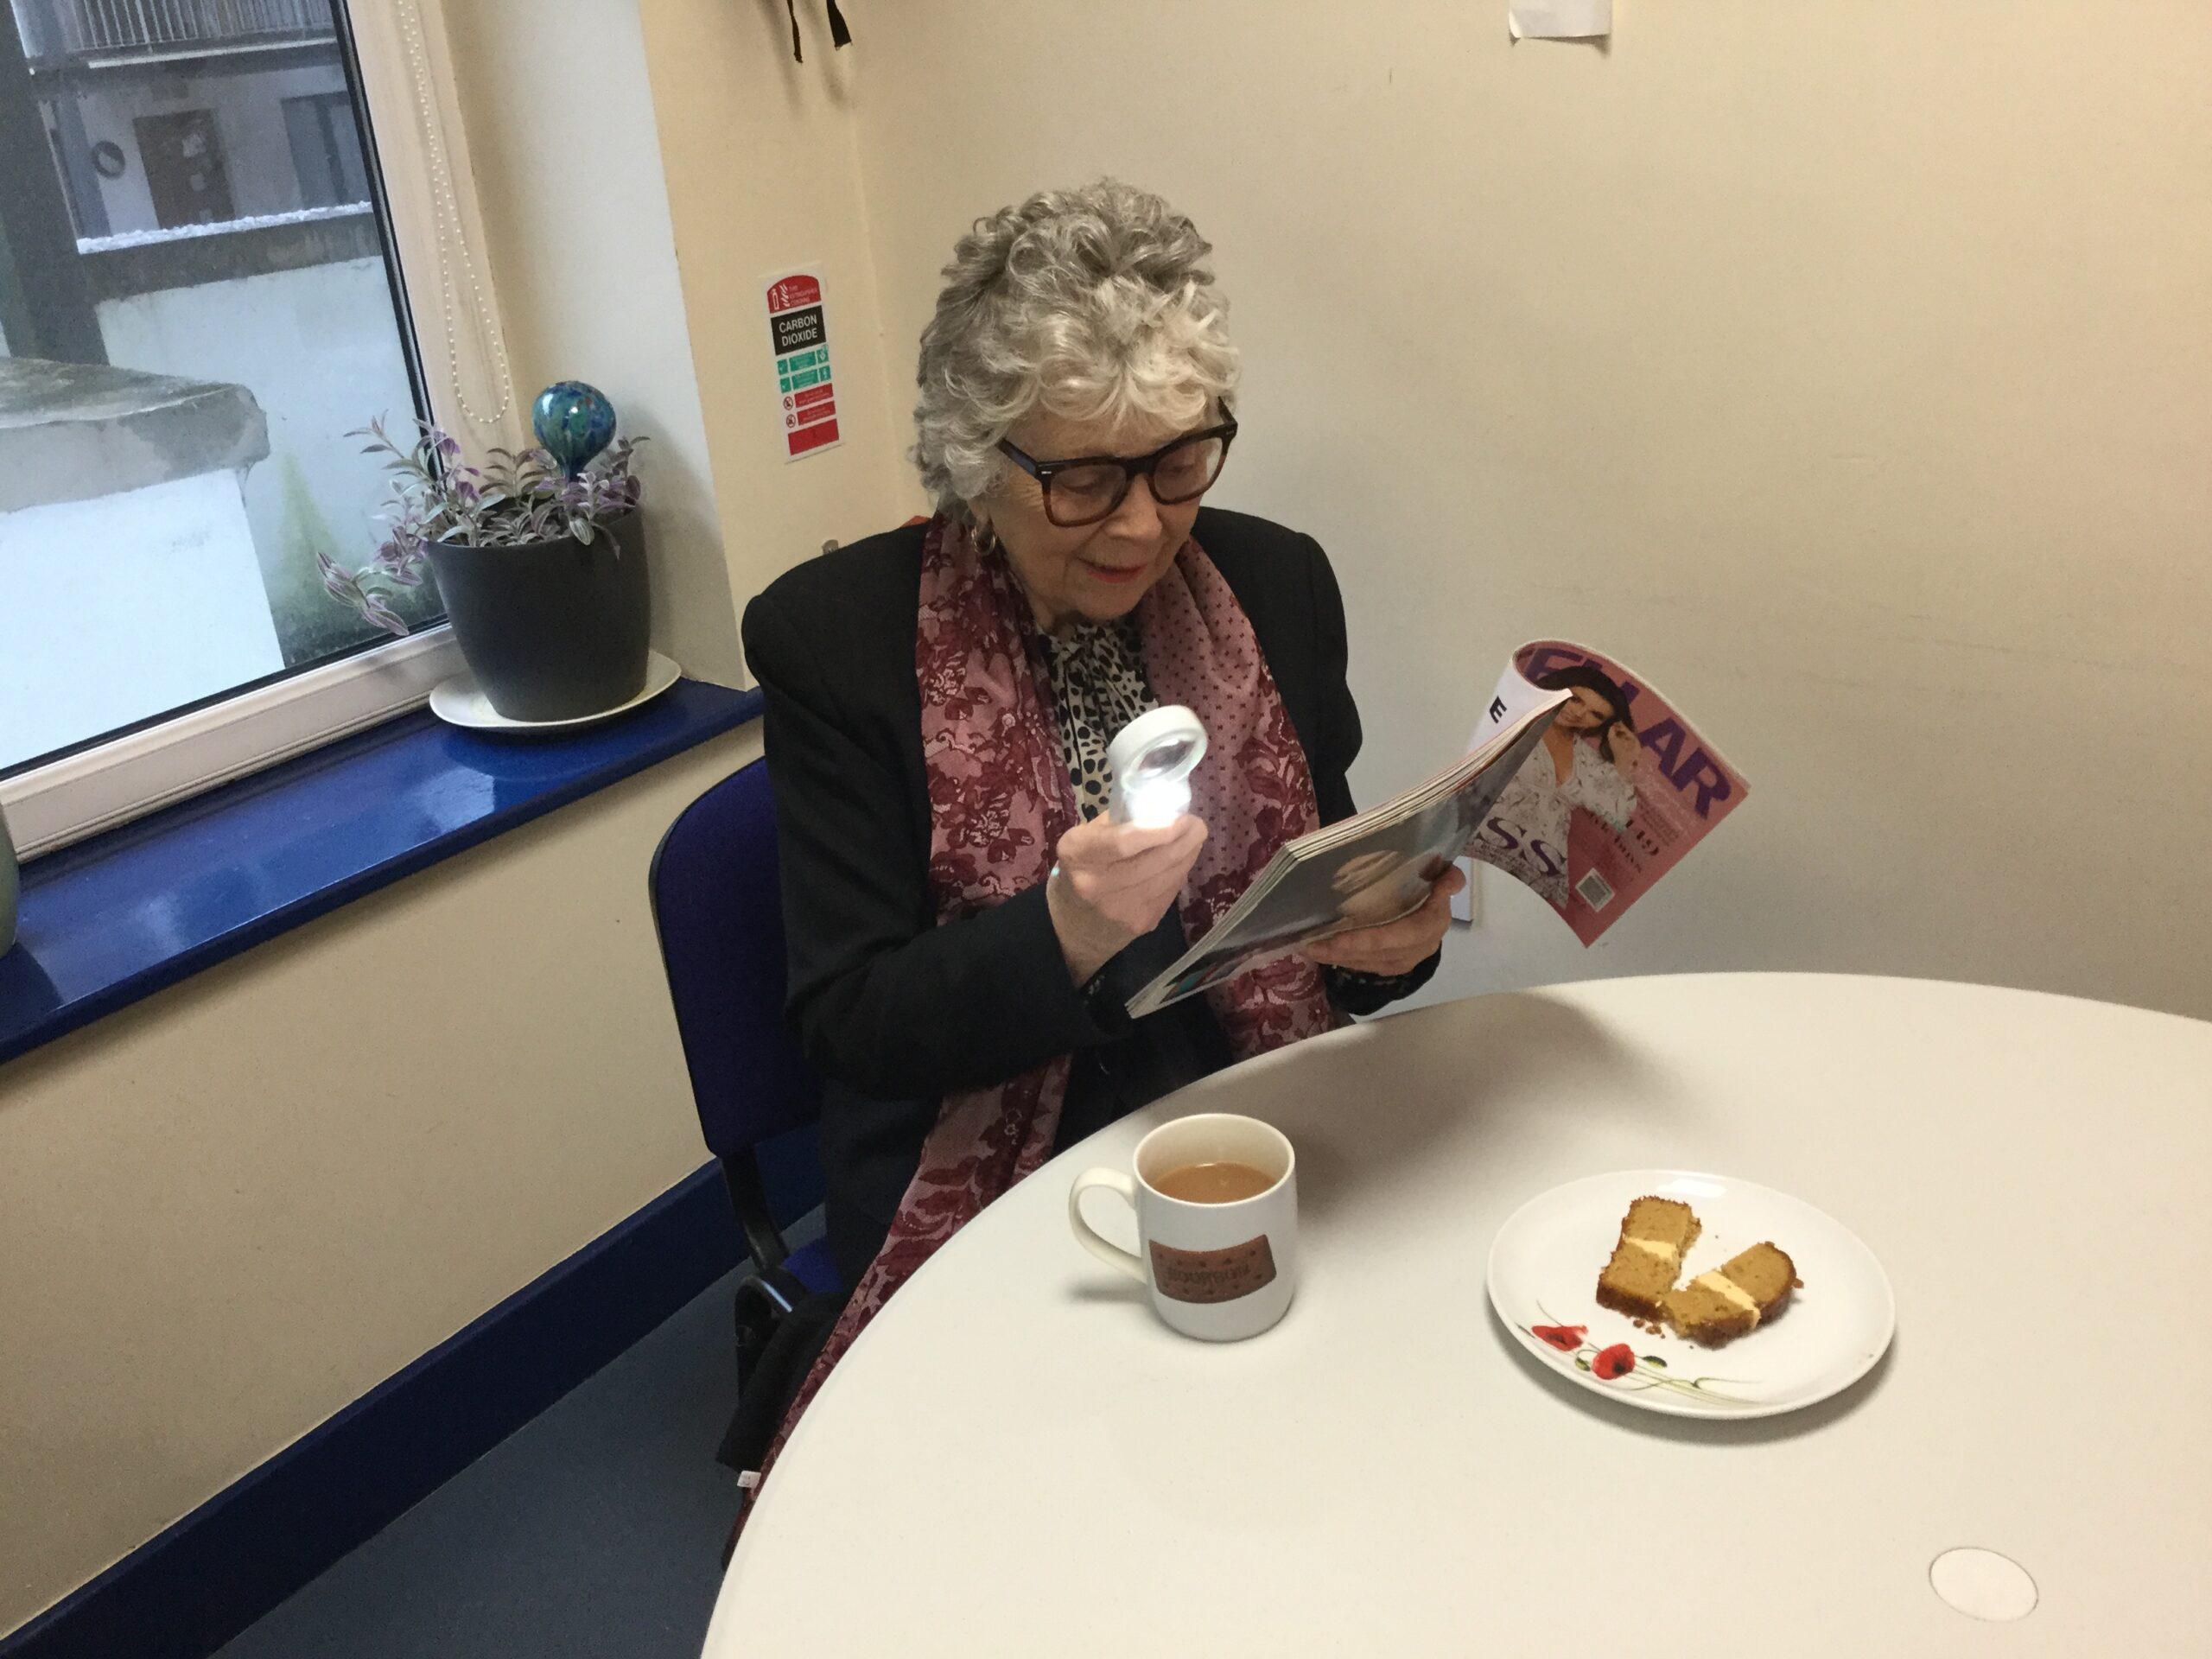 Image of Margaret reading using magnifier